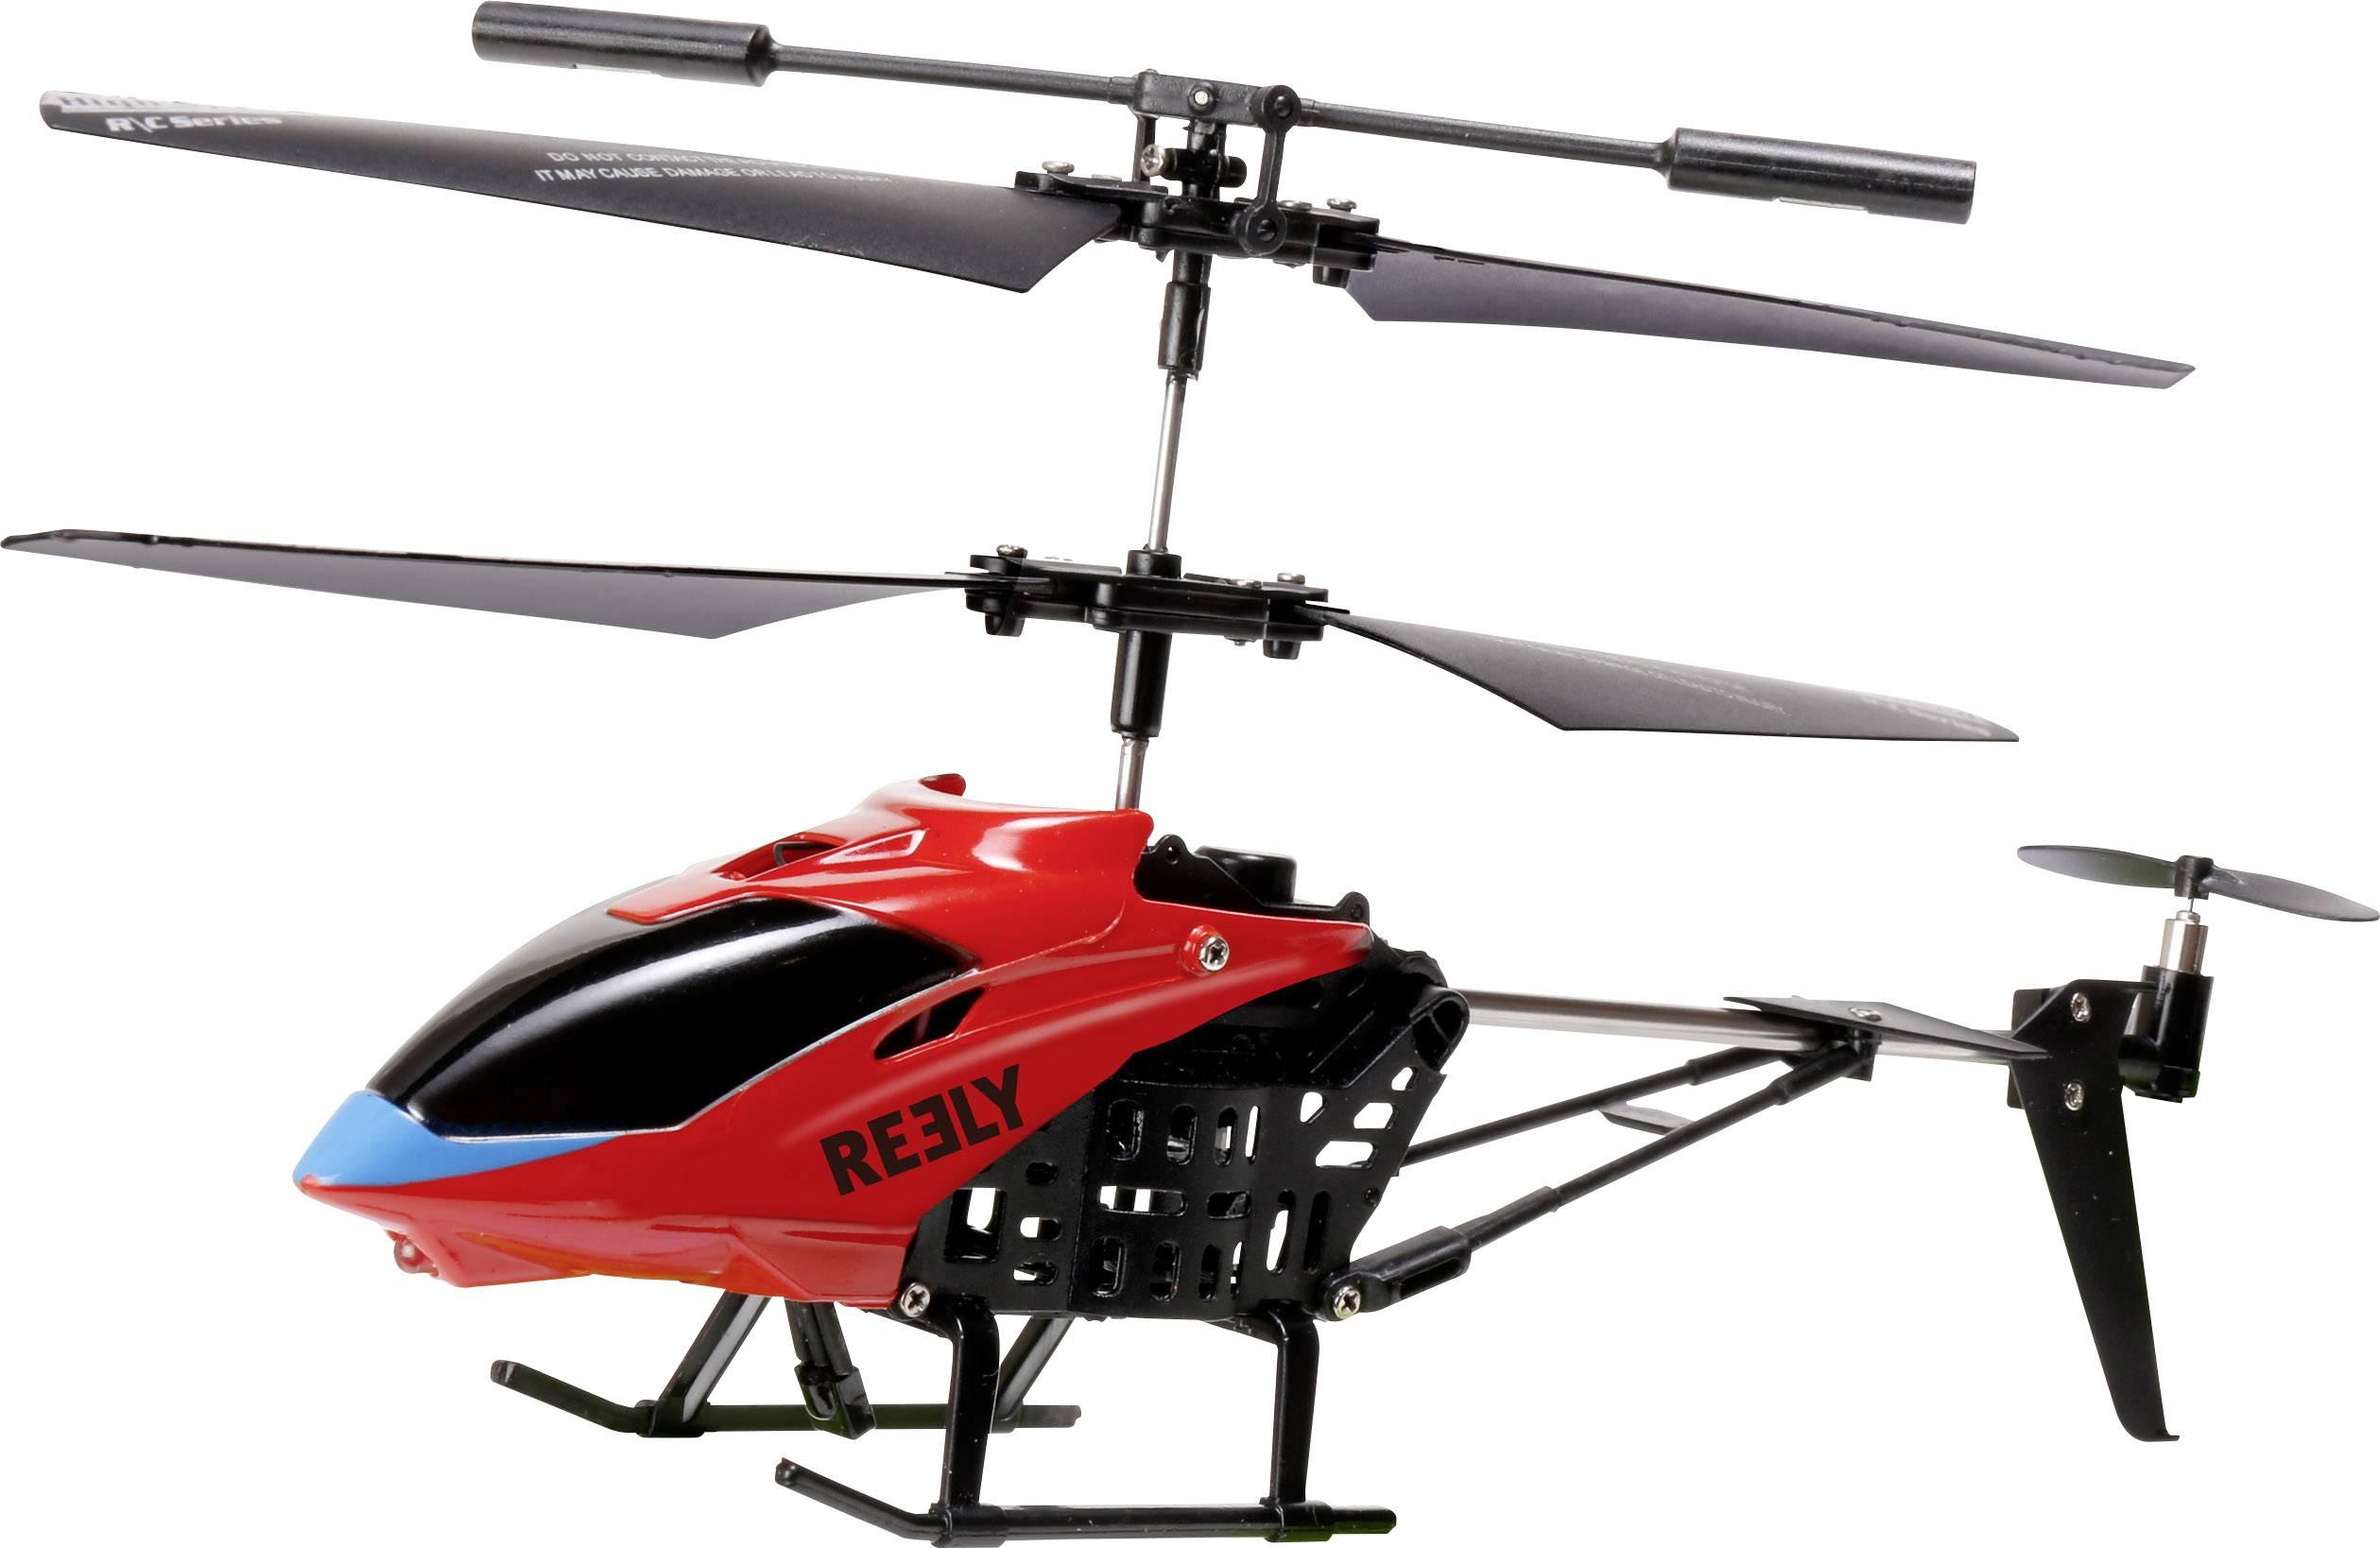 RC vrtuľník Reely RtF